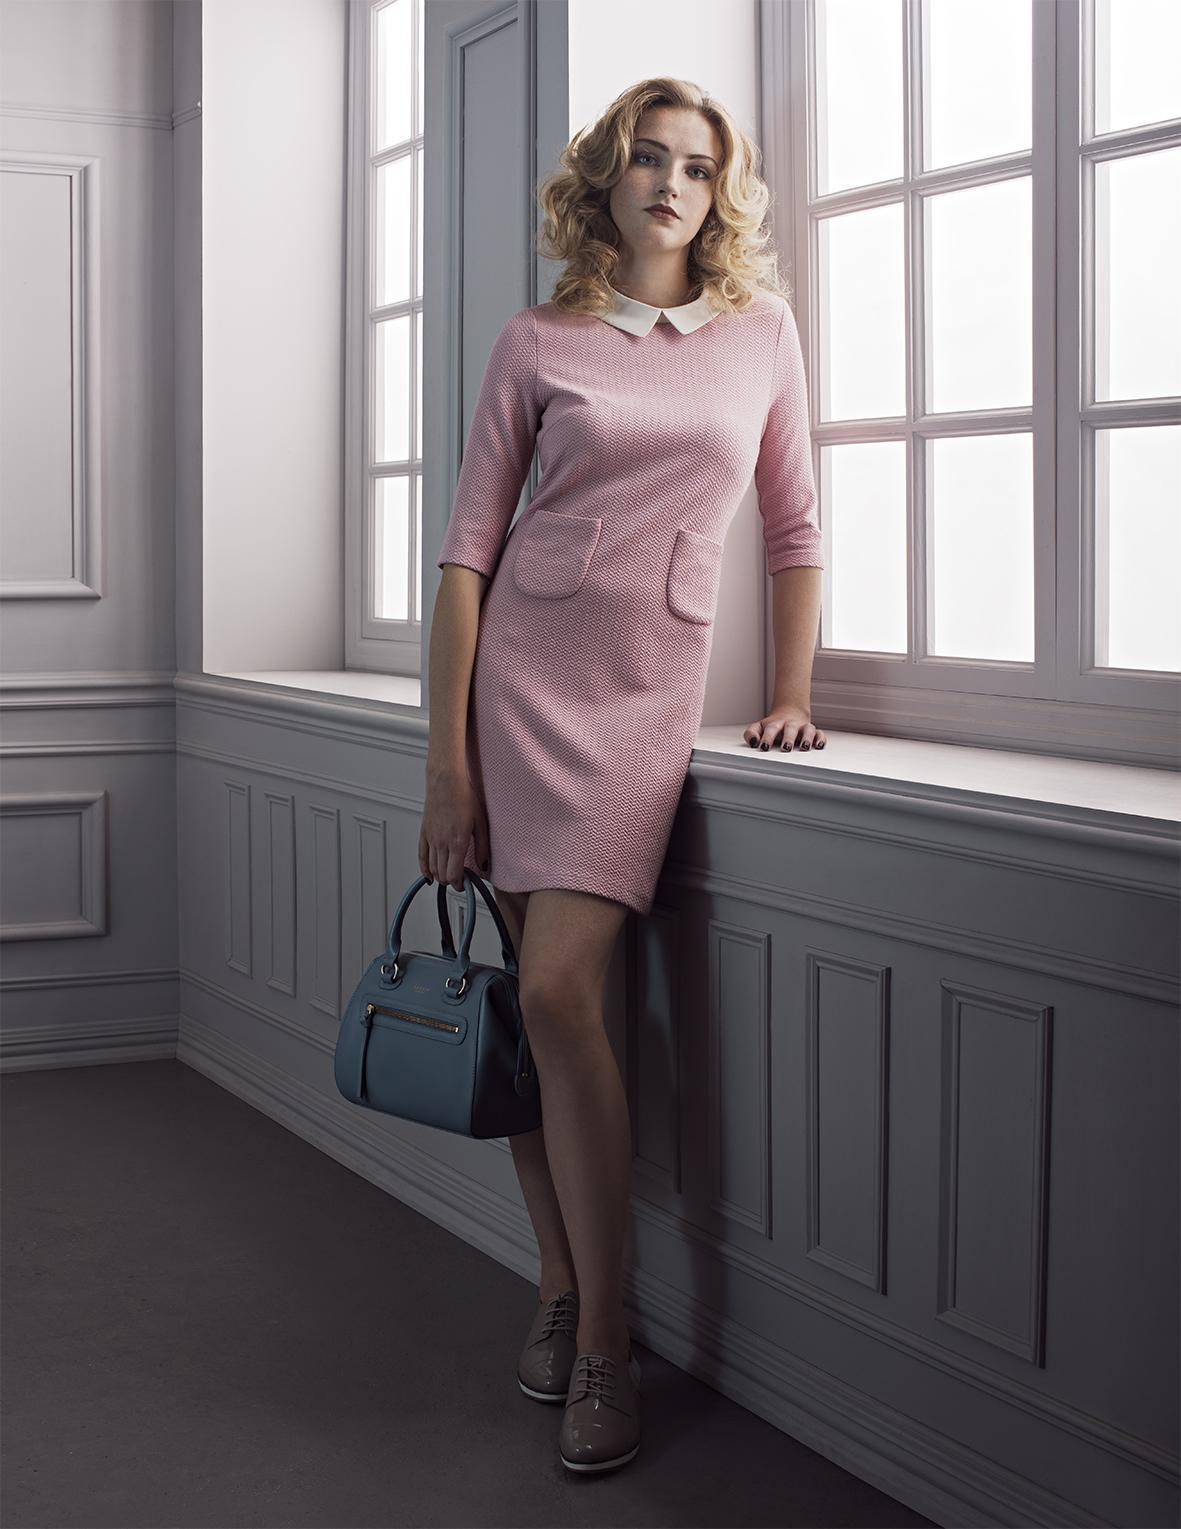 Dress Miss Pattina, Shoes Clarks, Bag Radley